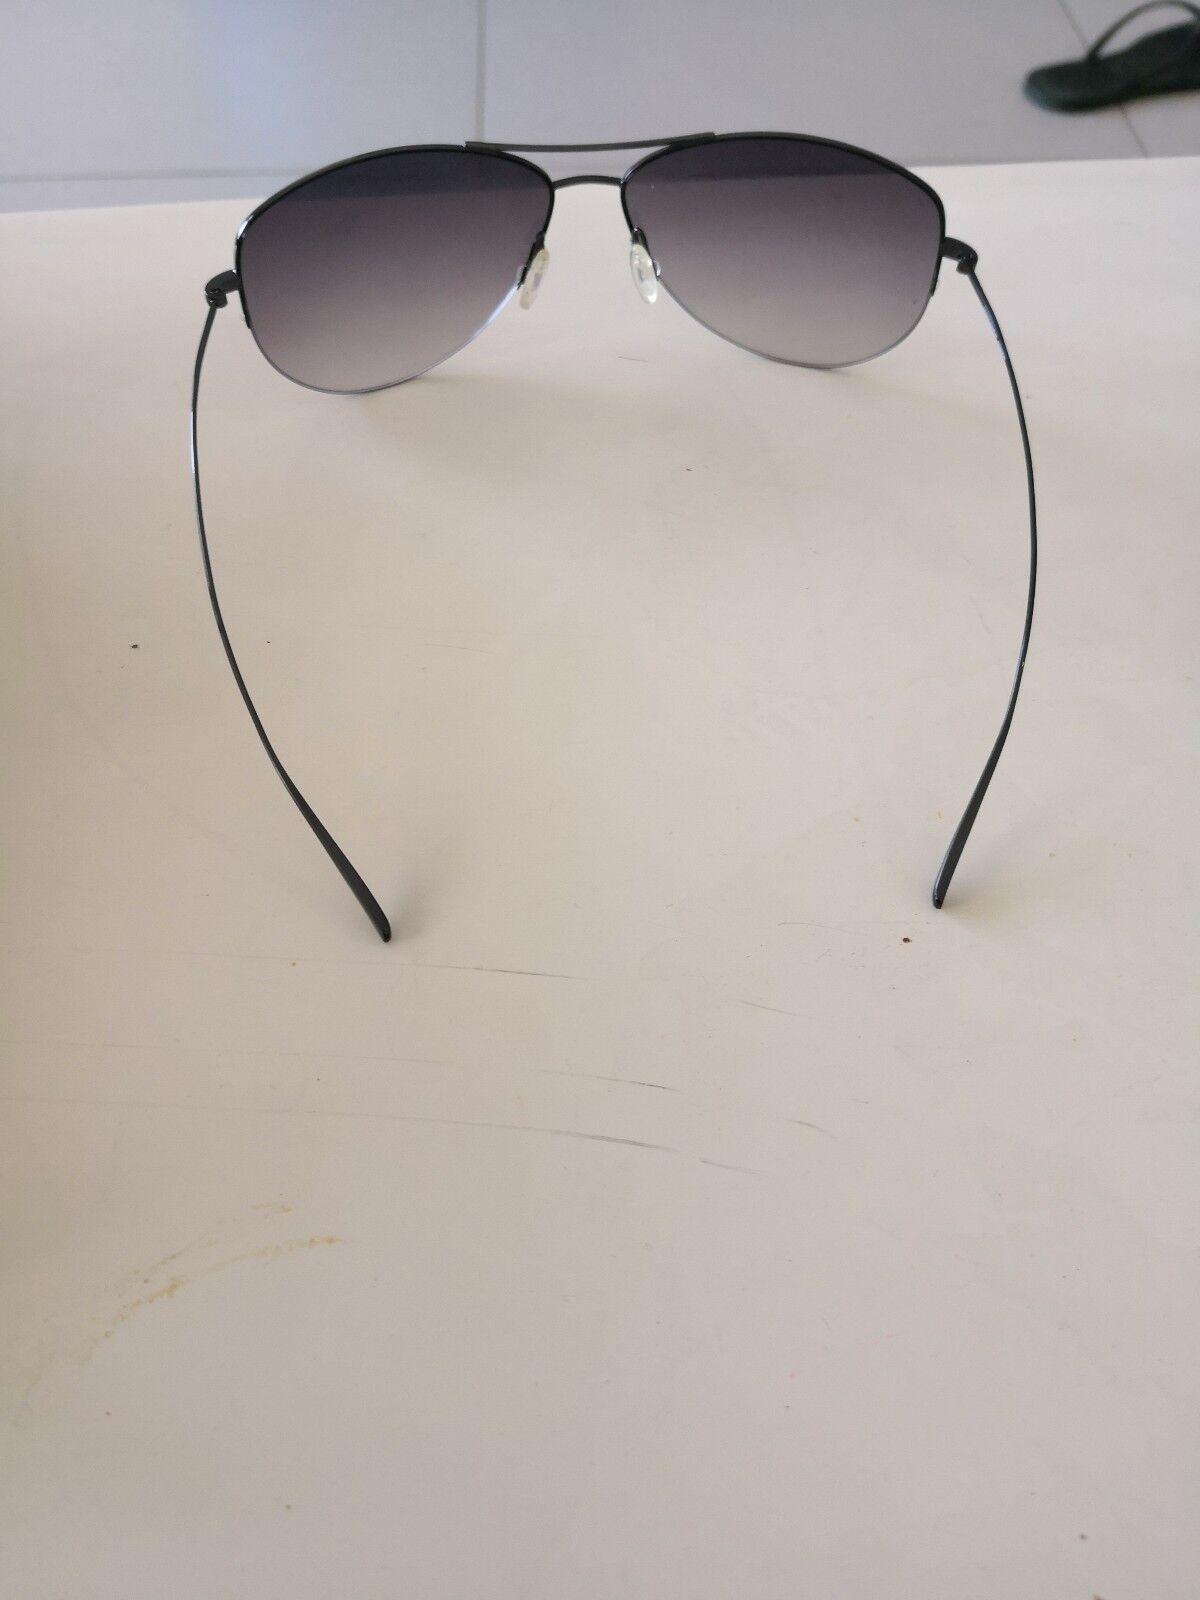 baa449e2ec Oliver Peoples Strummer Angelina Jolie Sunglasses The Rock Sunglasses for  sale online